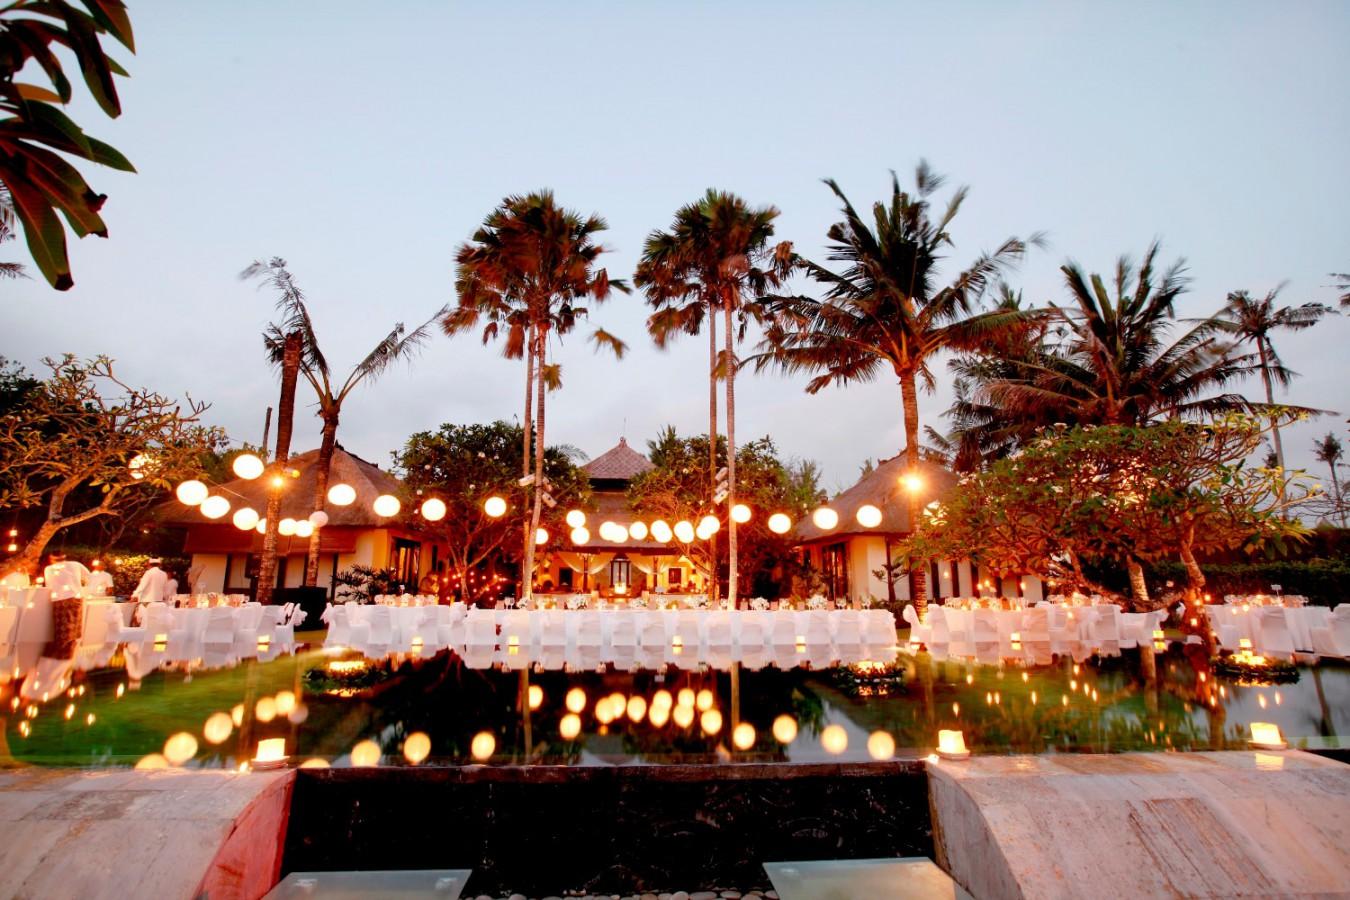 2011.10.16, Megann and Daniel, Ombak Luwung, MJY - Bali Wedding Paradise (27)